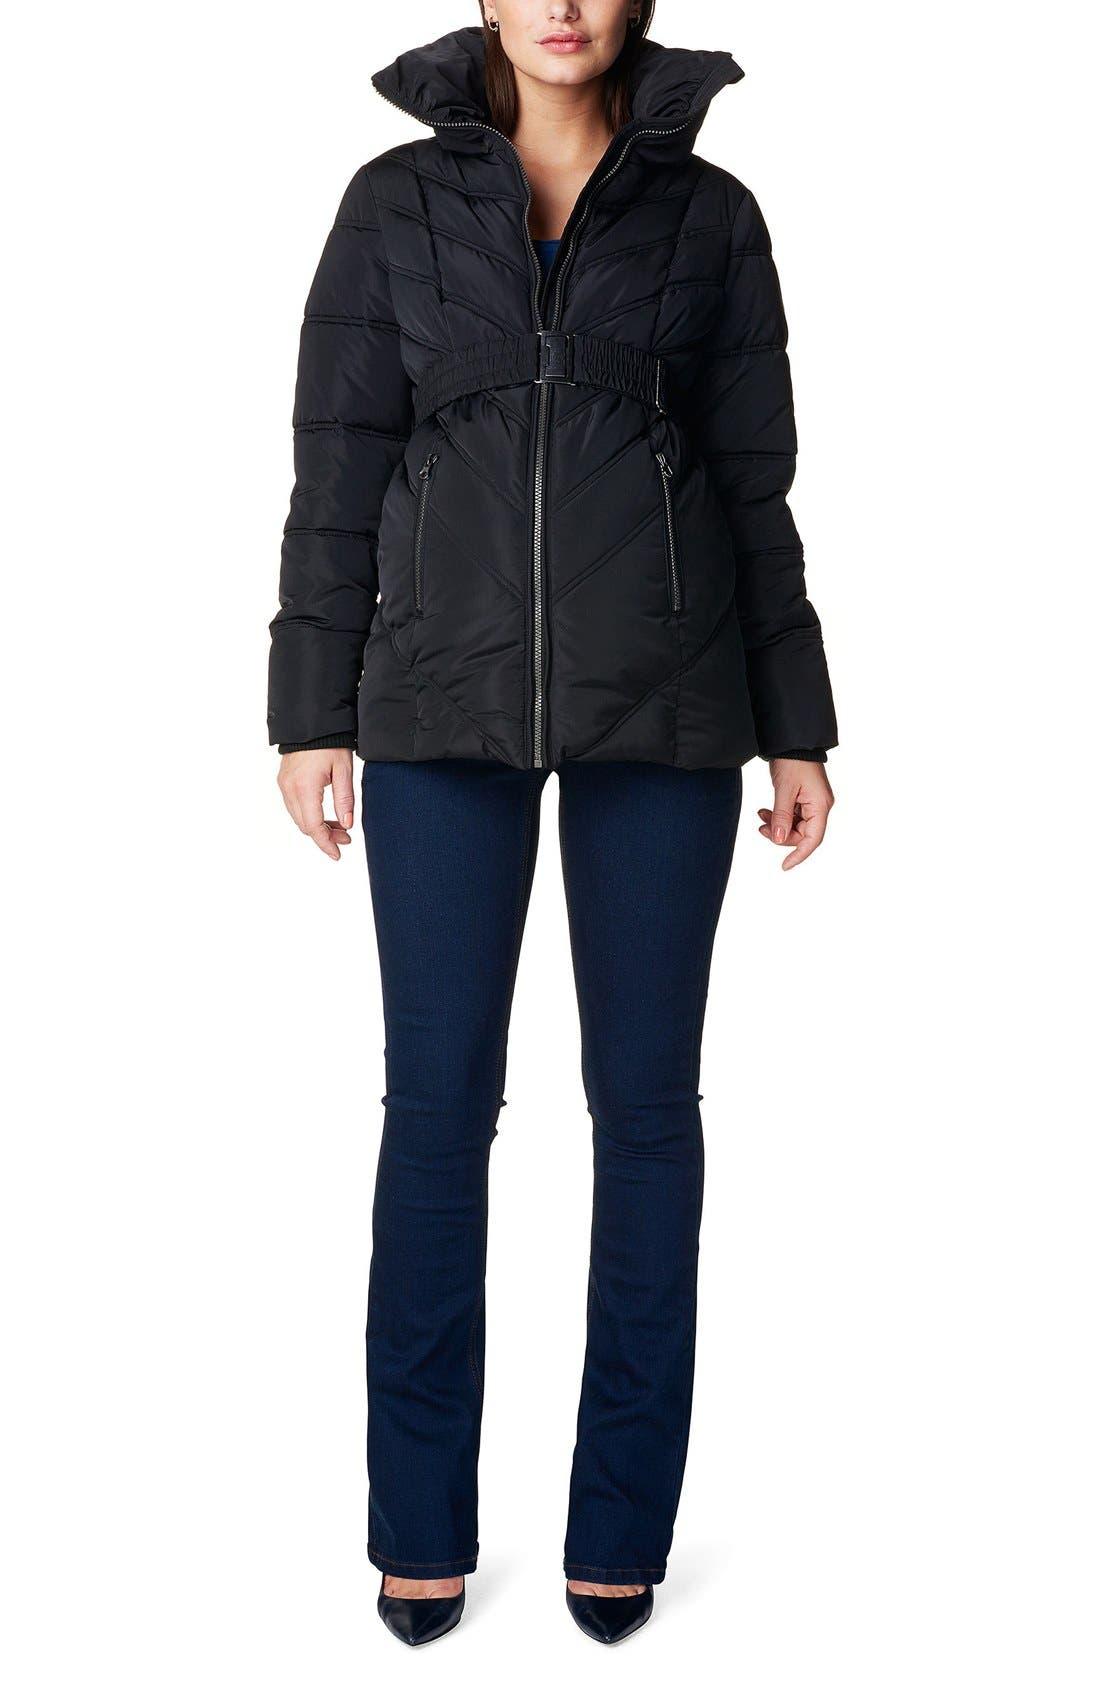 Main Image - Noppies 'Lene' Quilted Maternity Jacket